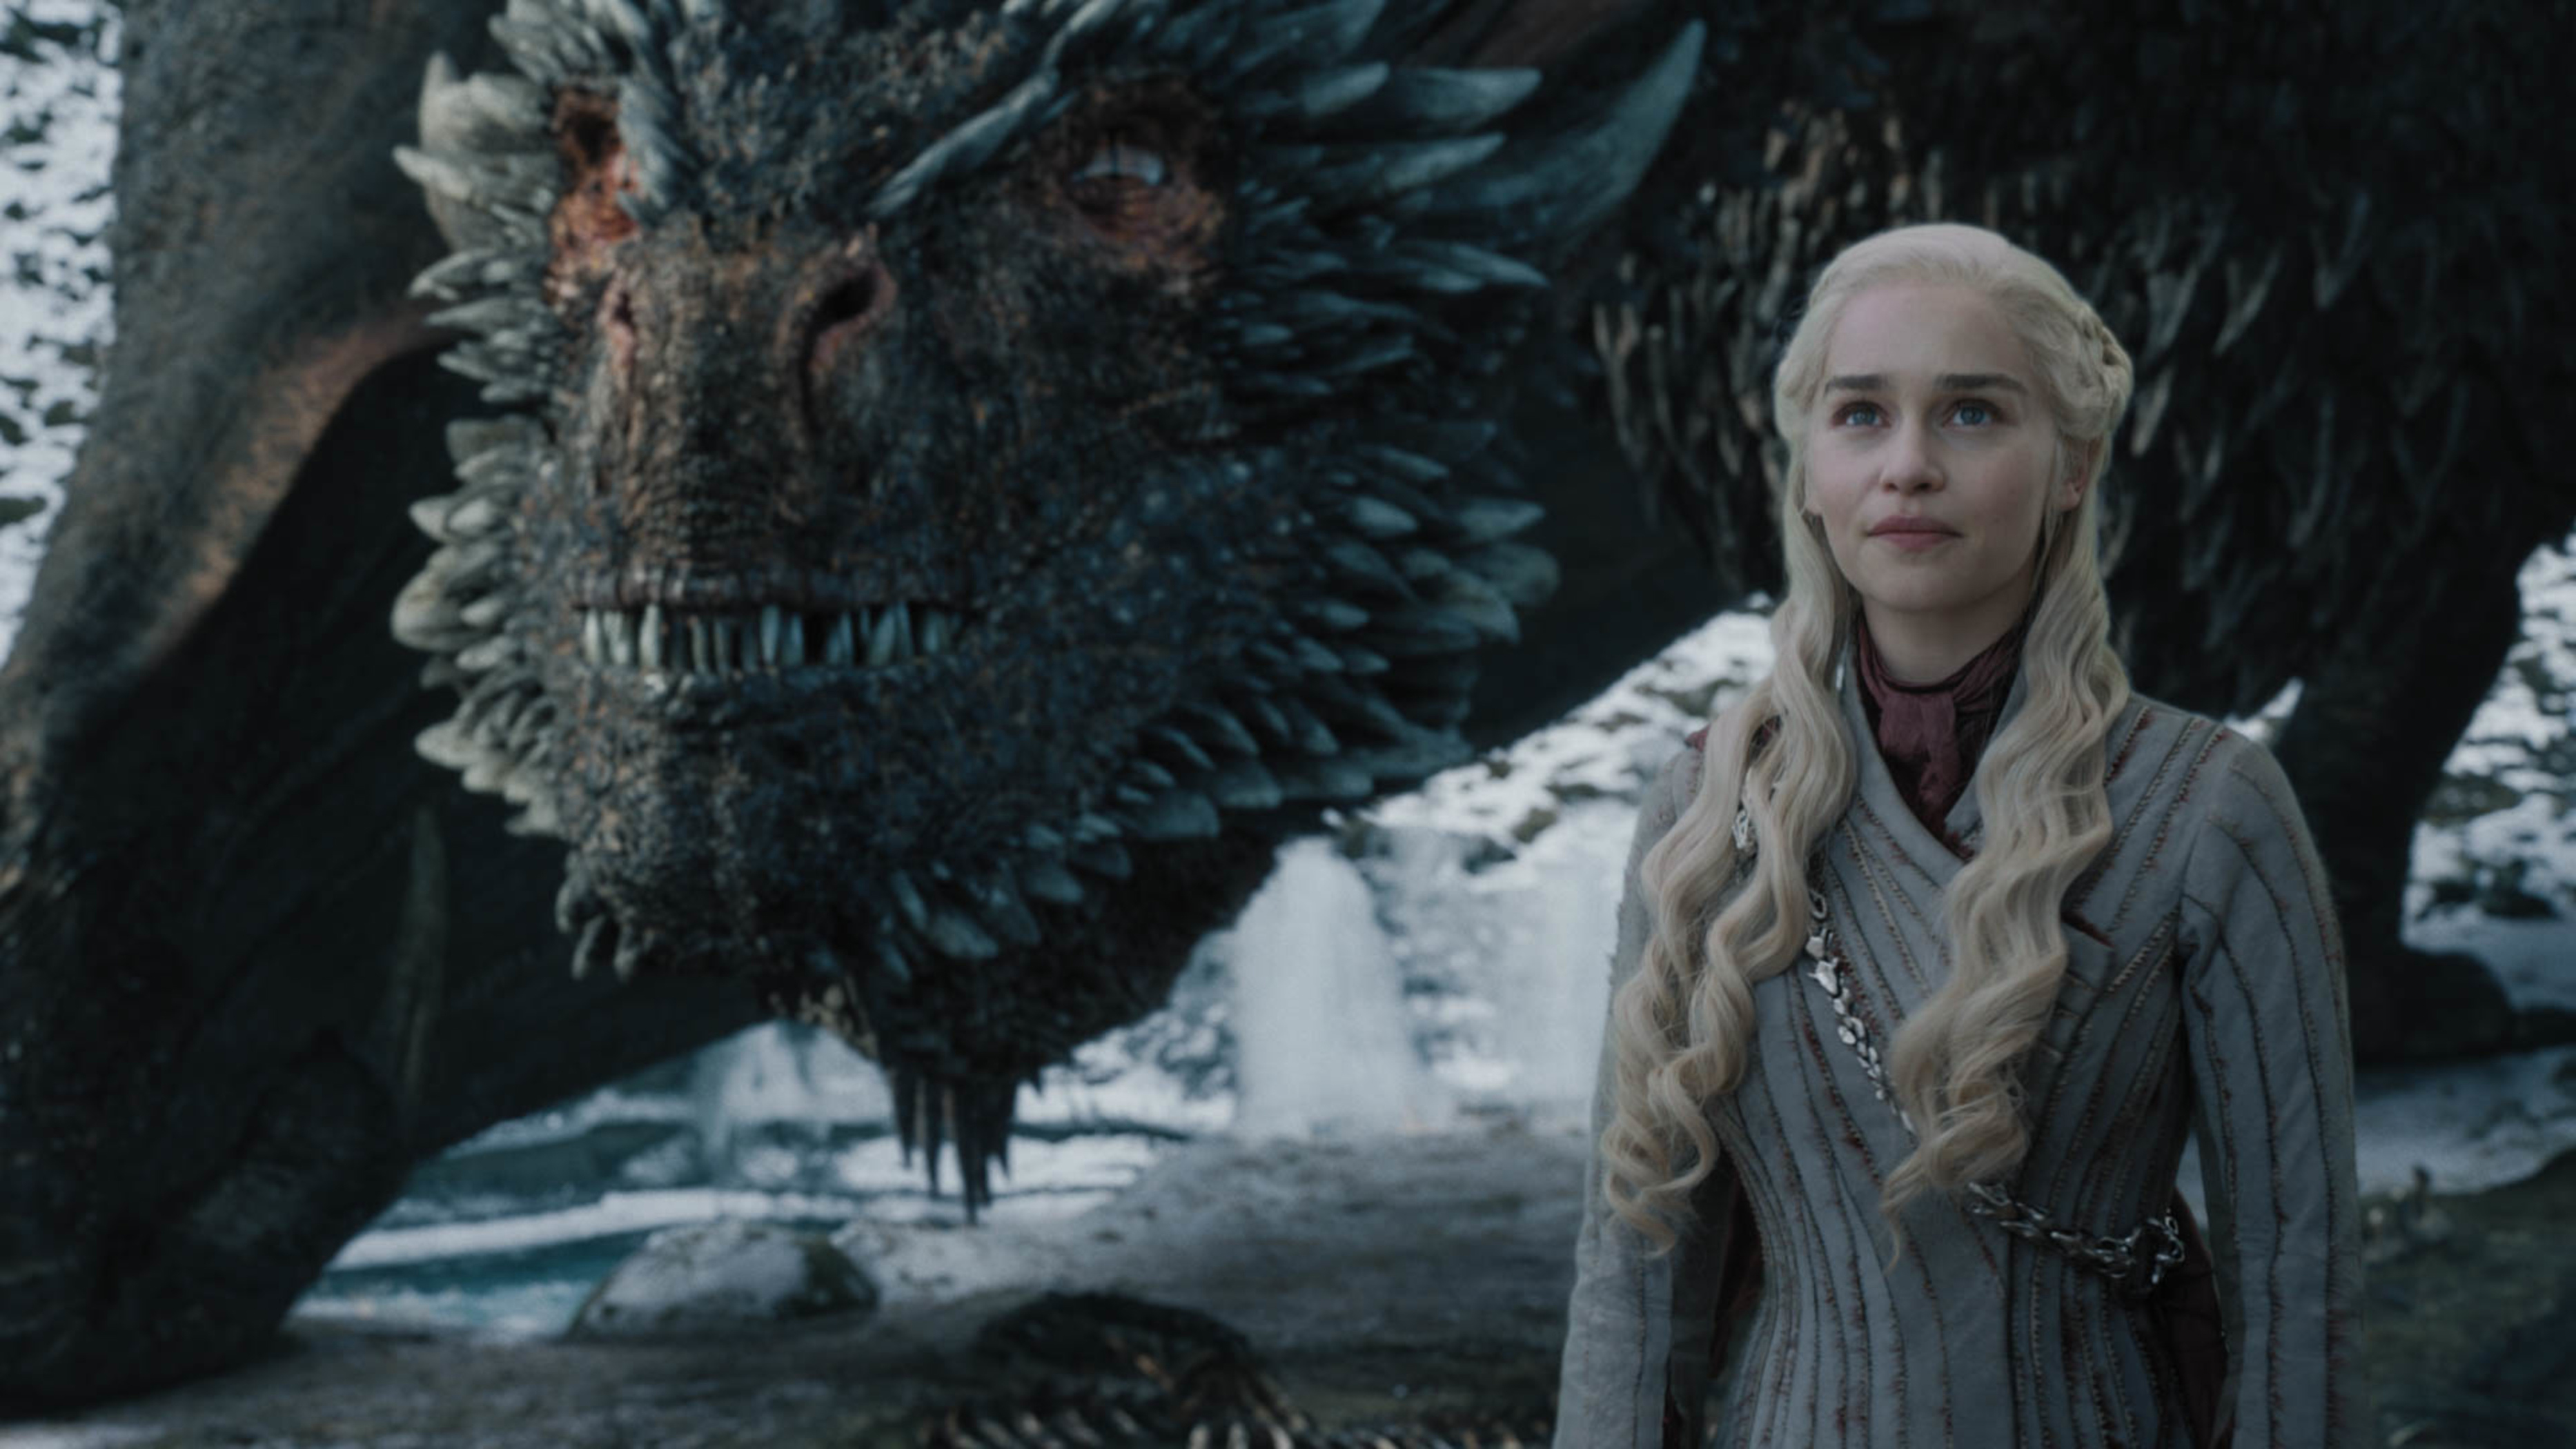 Game of Thrones season 8 episode 4 - Drogon and Daenerys